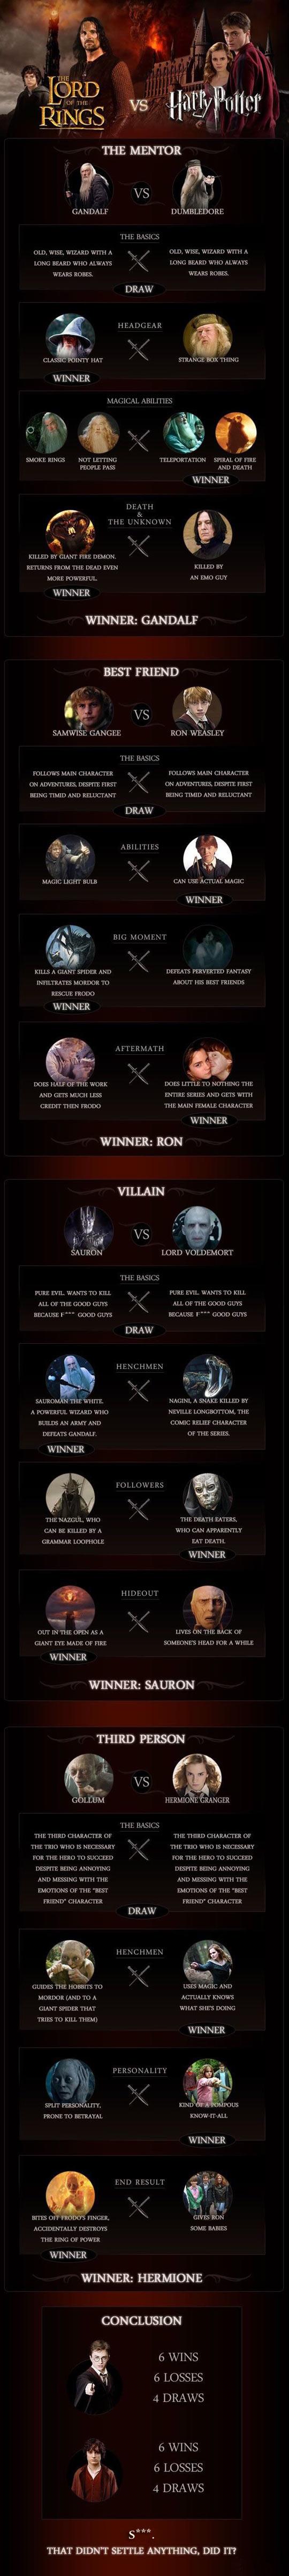 cool-LoTR-Harry-Potter-versus-contest